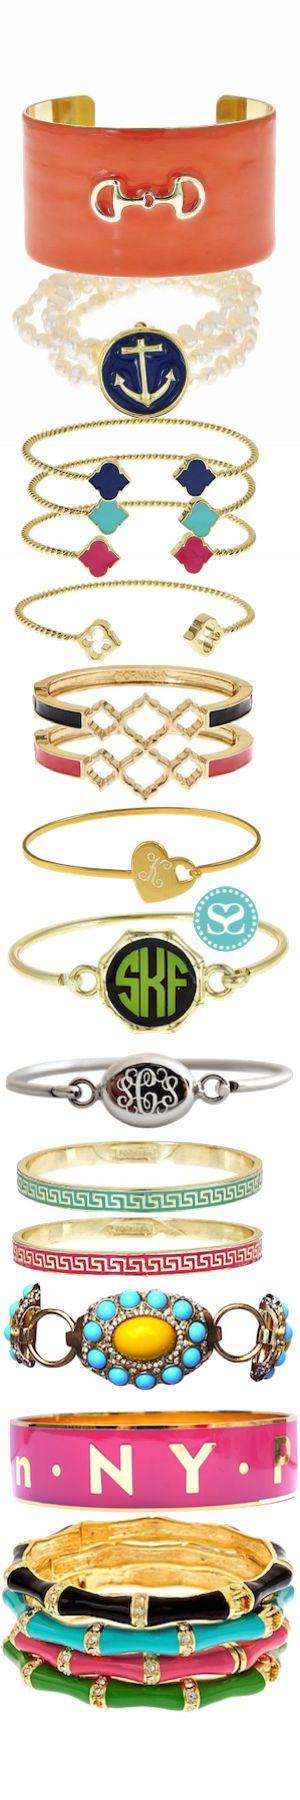 Bracelets, bangles and a #monogram, oh my!  #armcandy